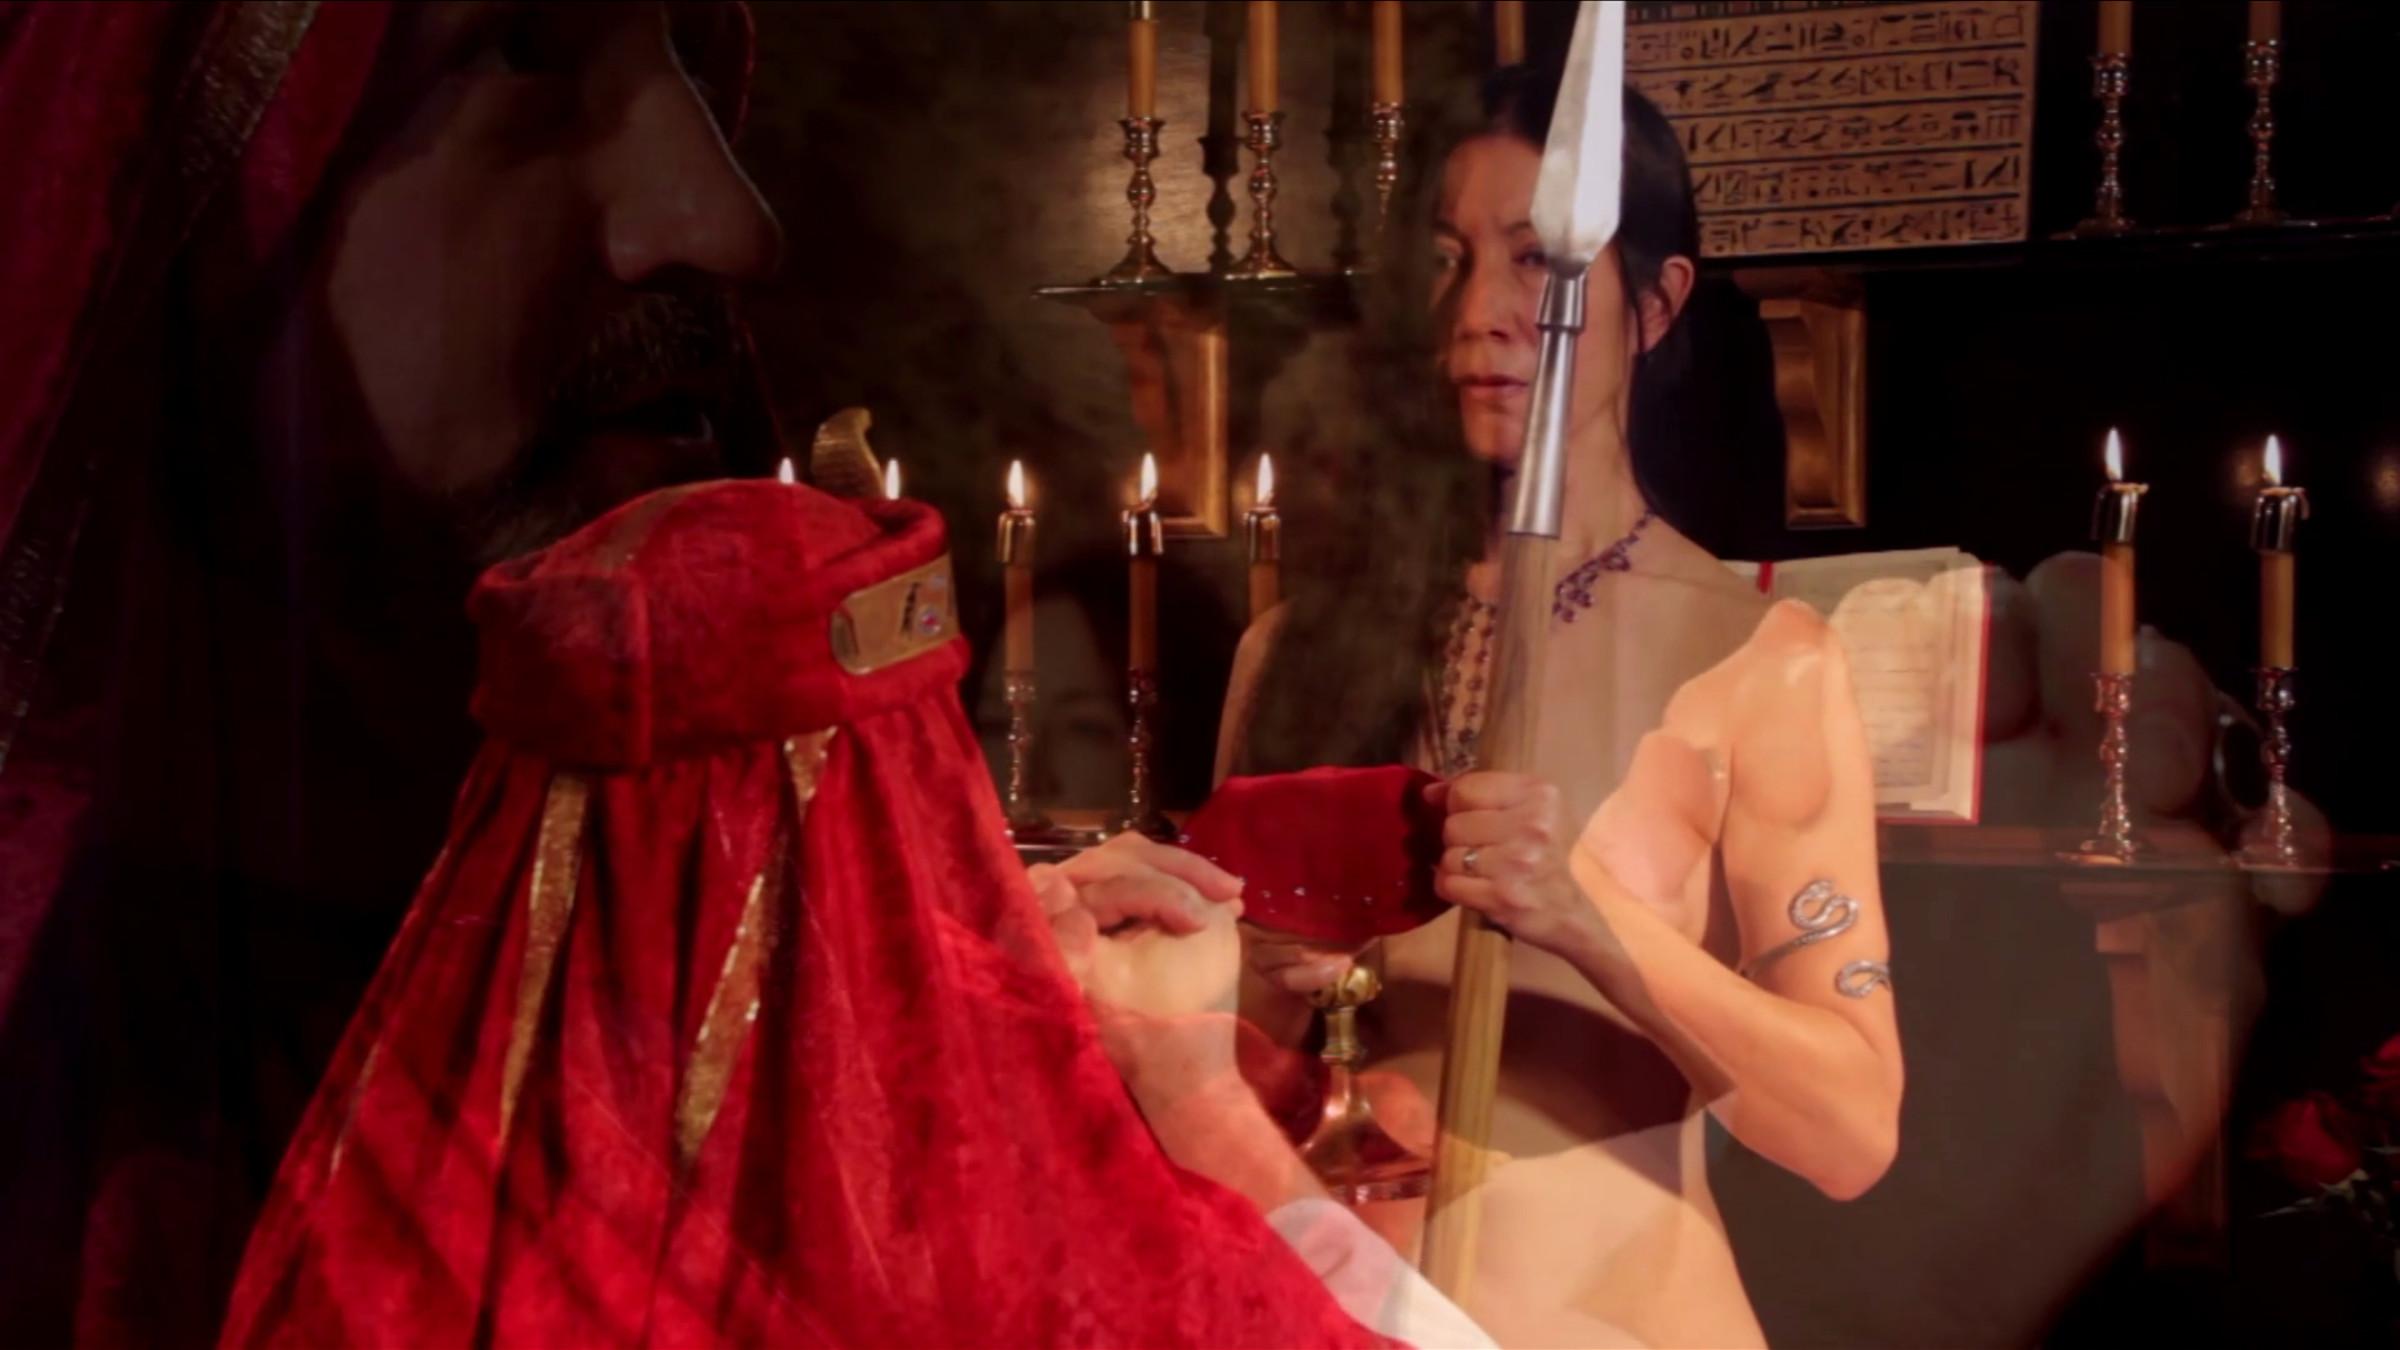 Ecclesia Gnostica Catholica